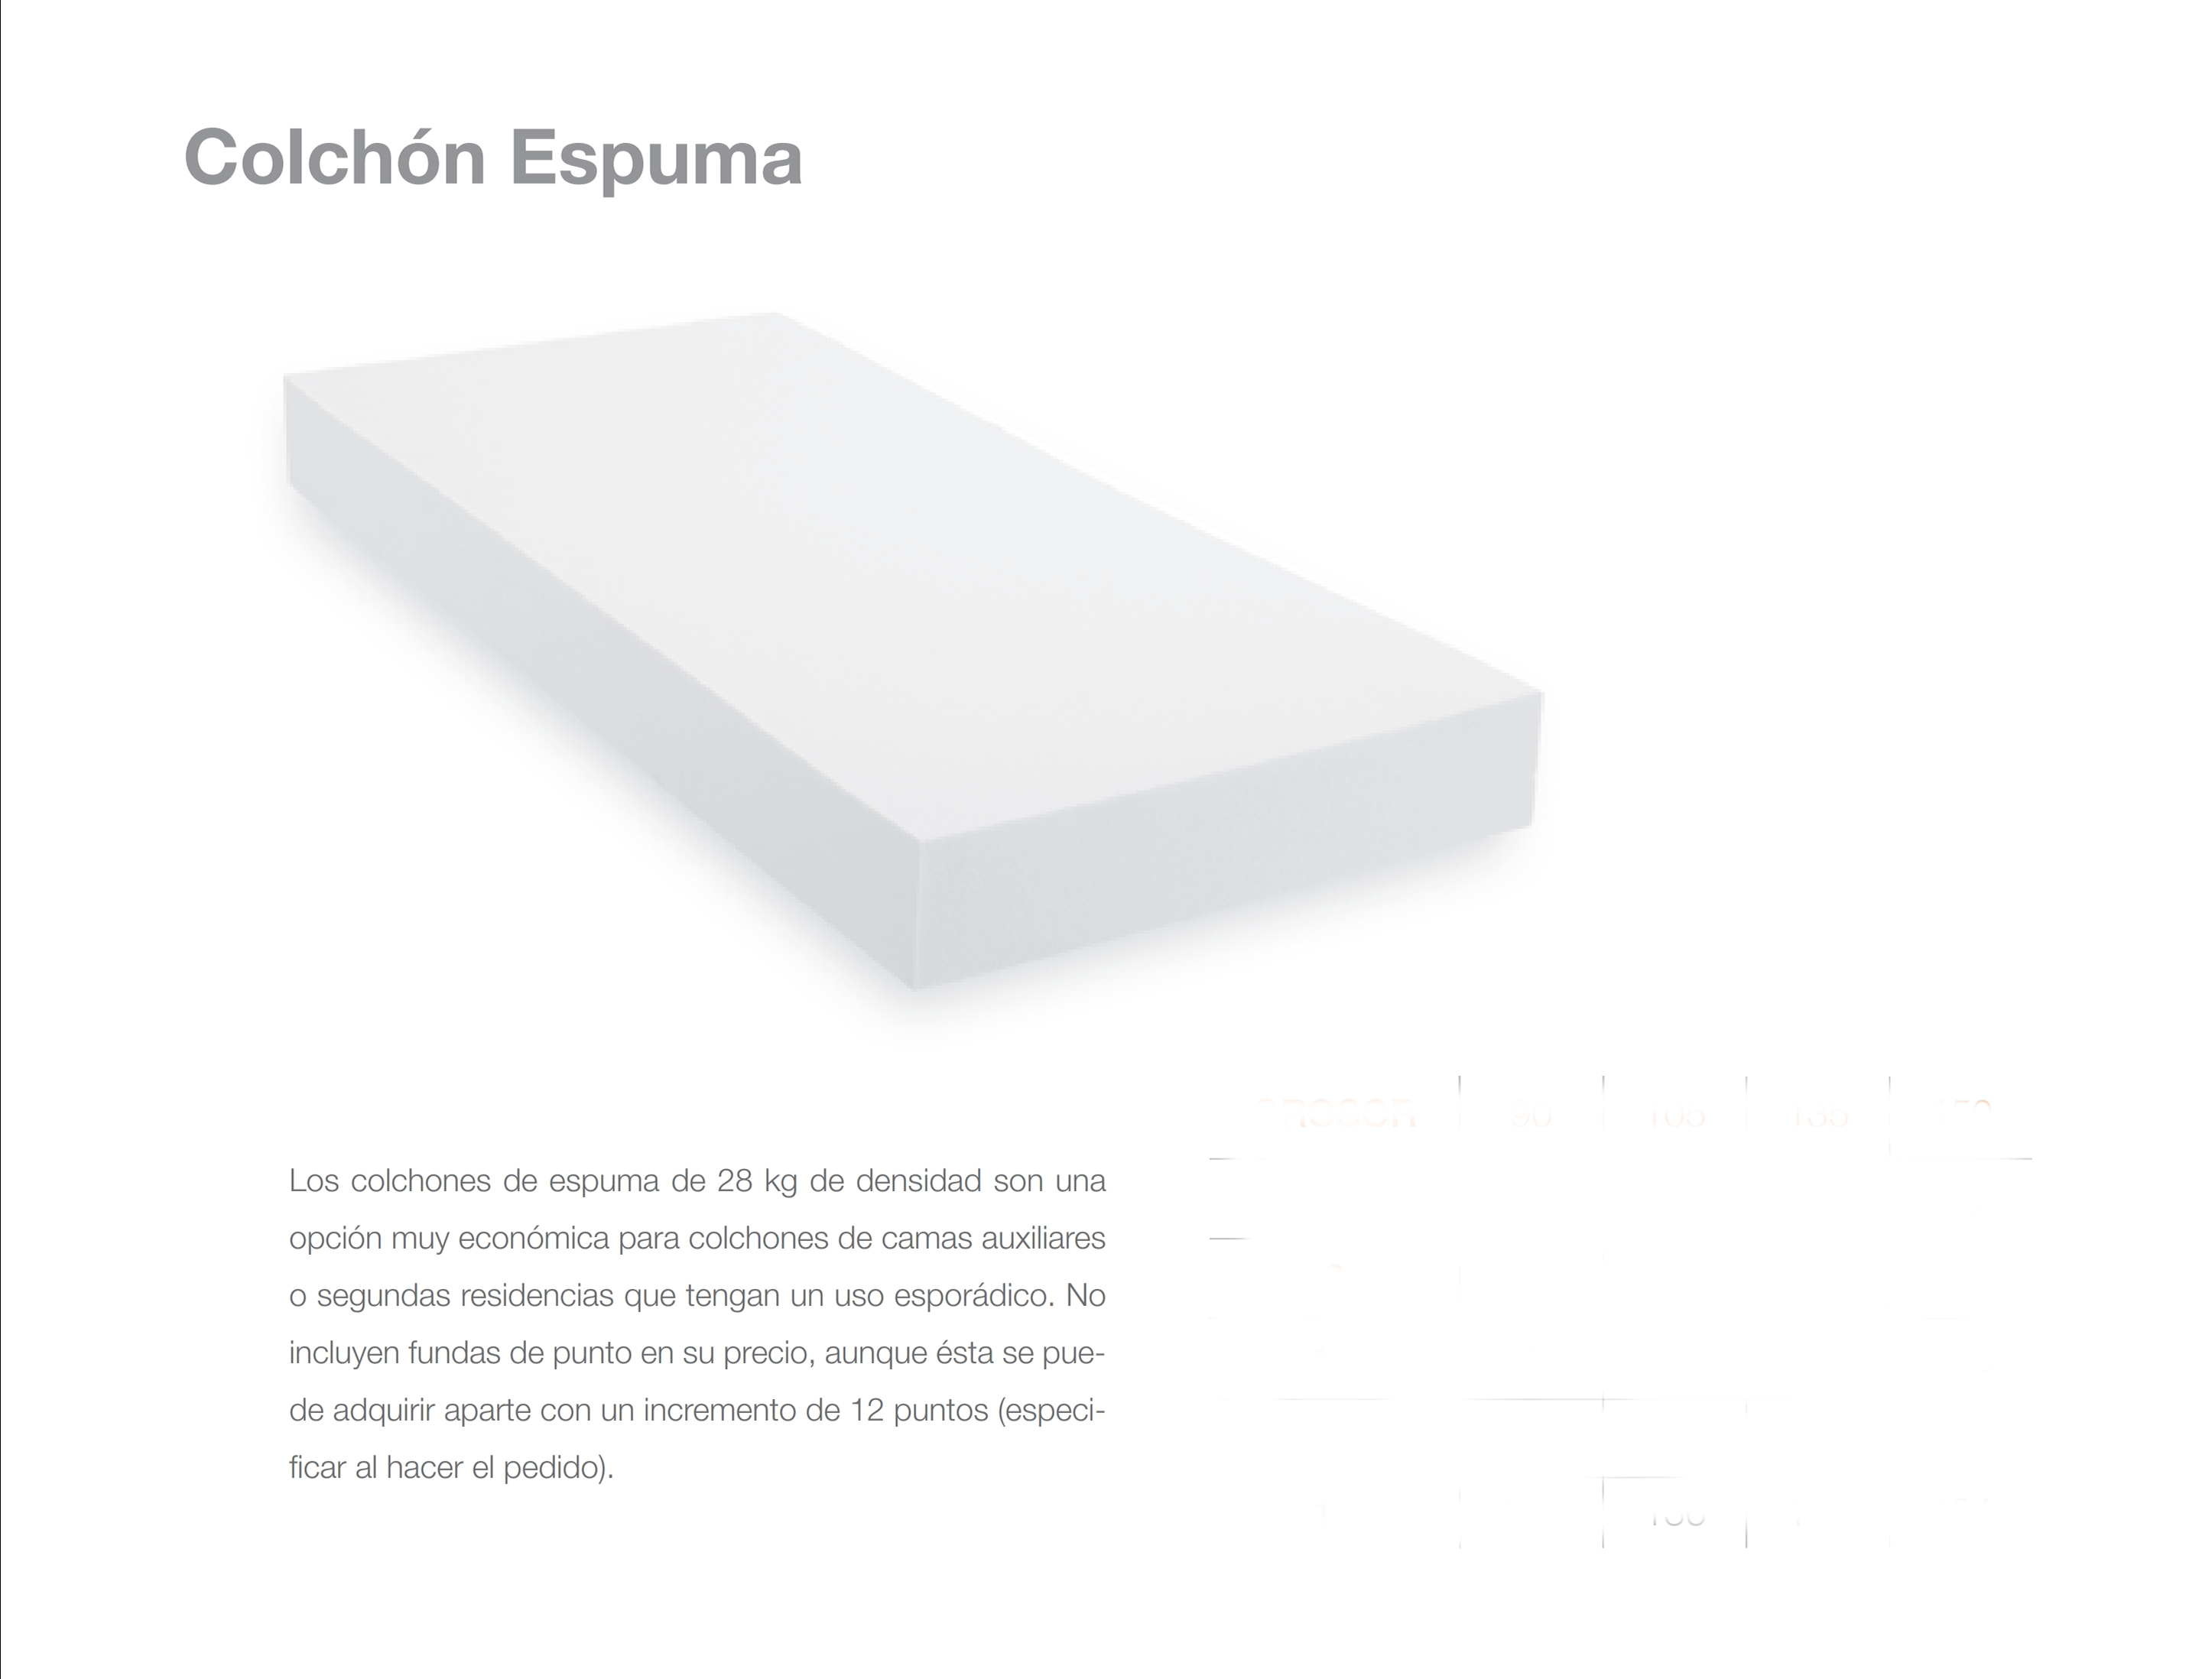 Colchón Espuma